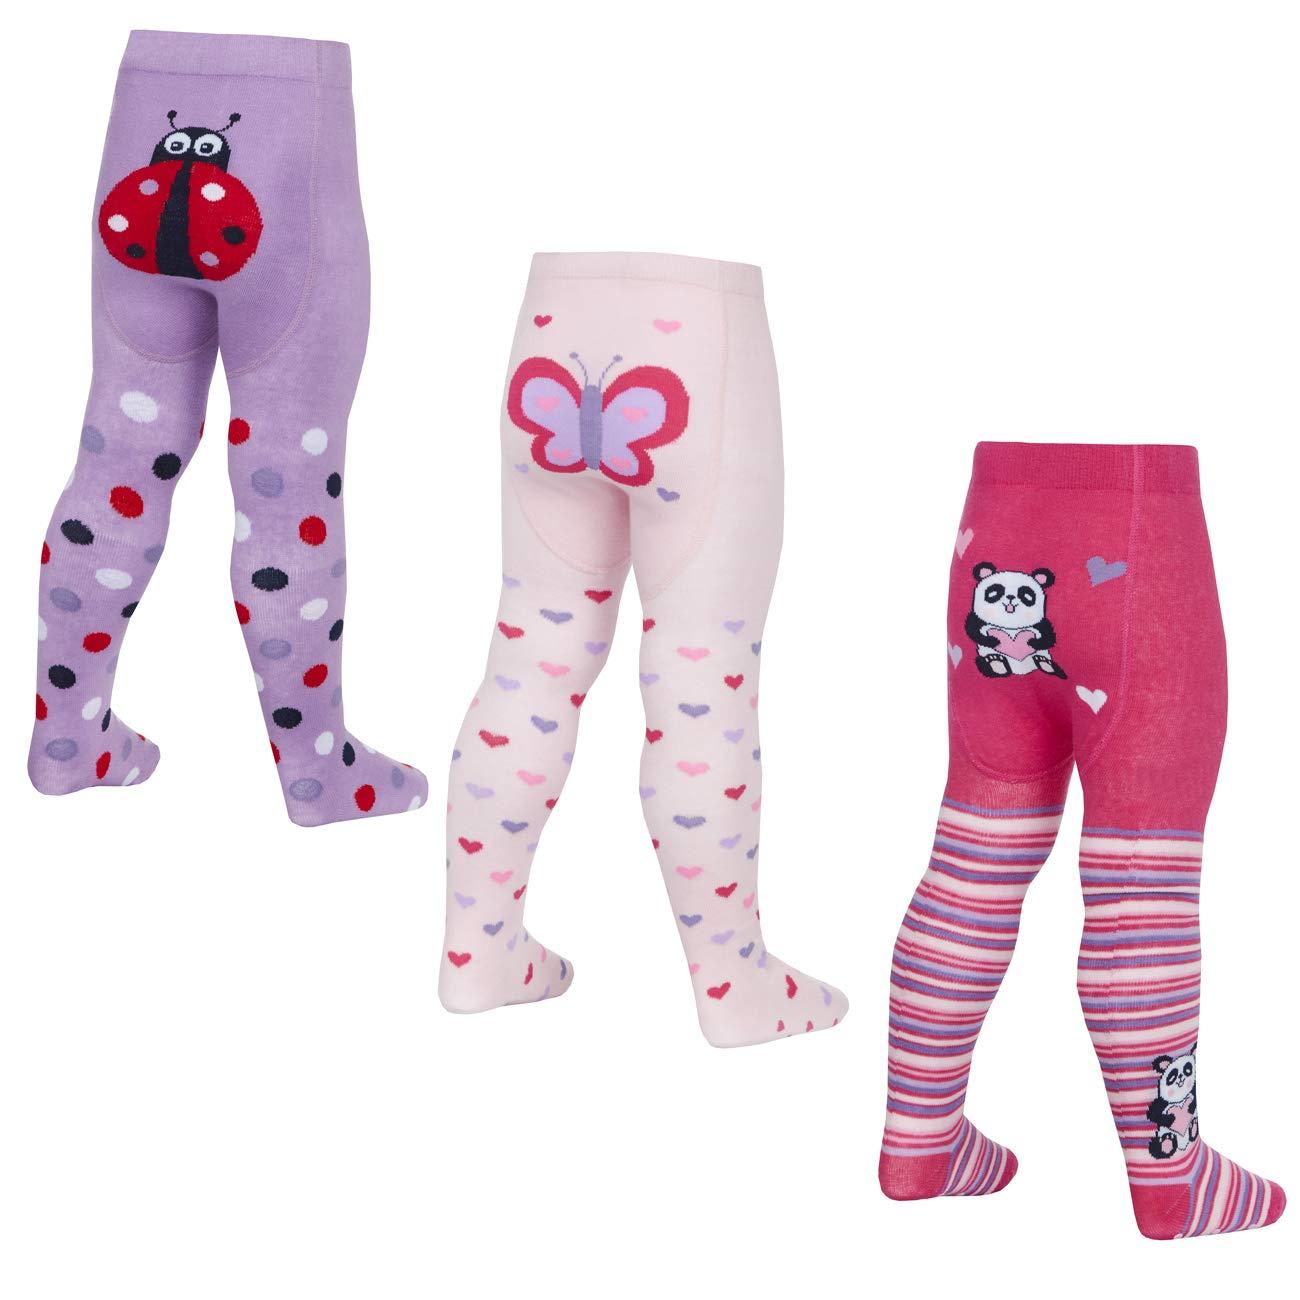 Metzuyan Babies Girls 3-Pack Tights Cotton Rich Non Skid